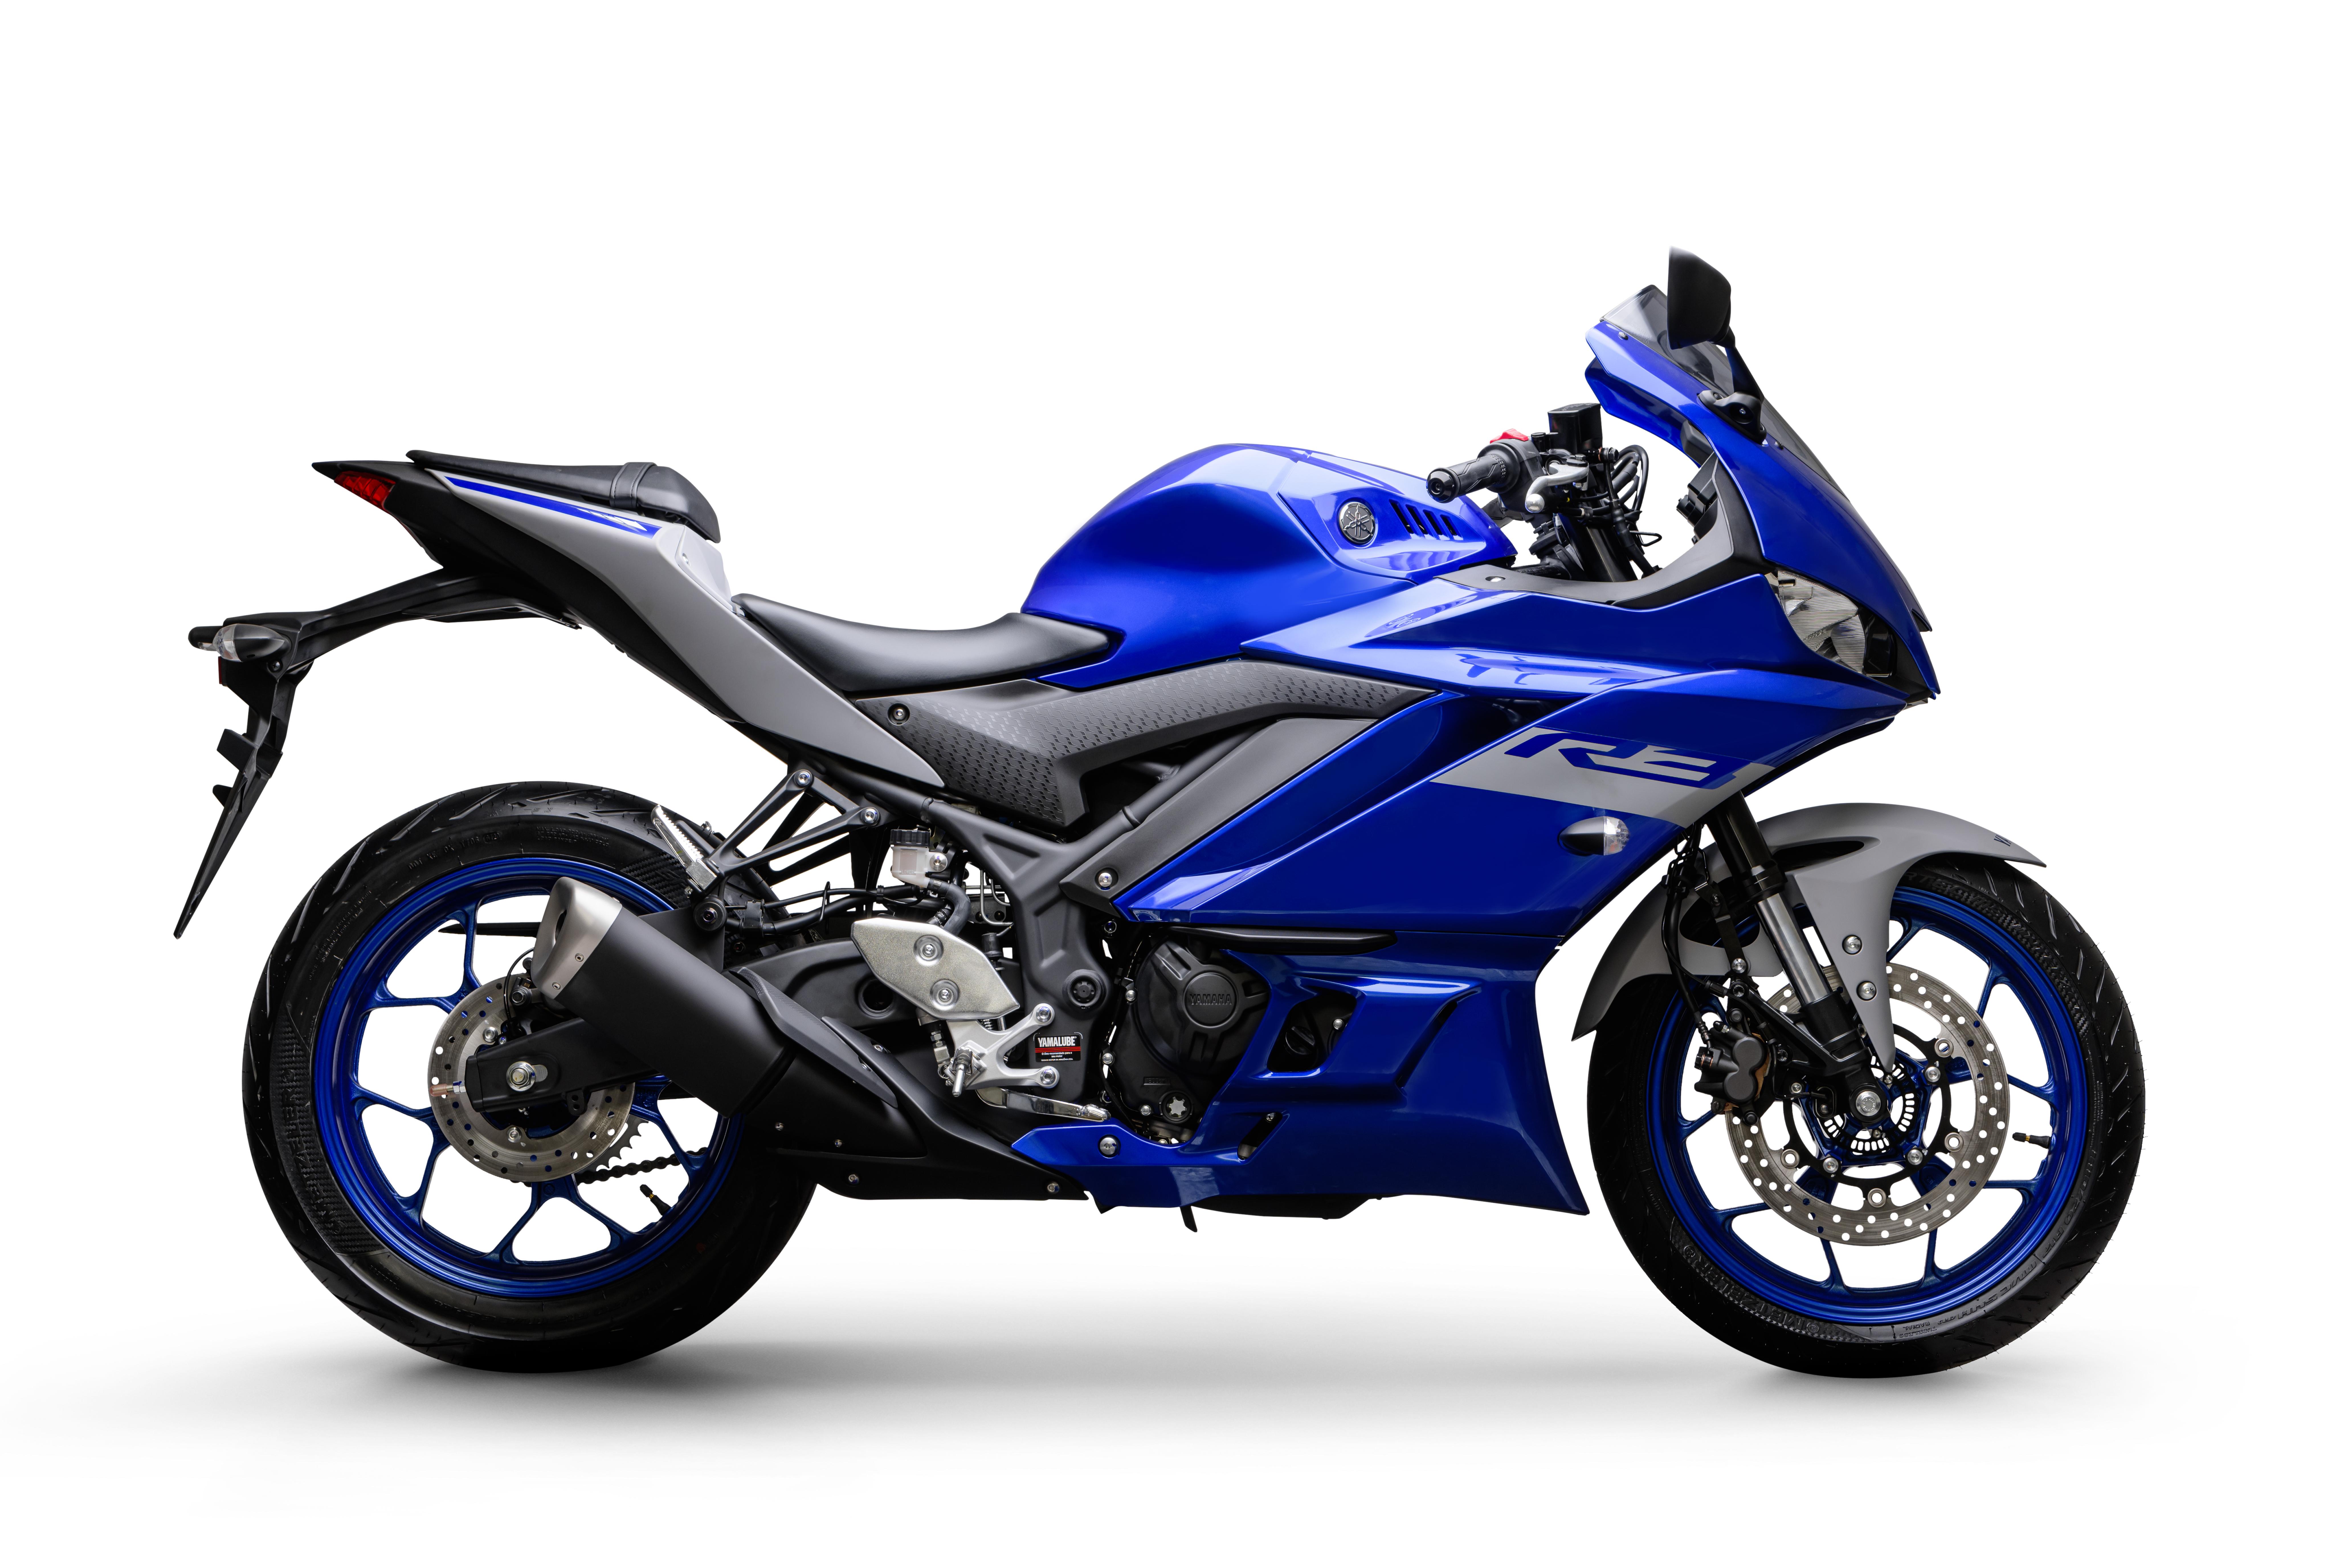 2020_R3_RACING_BLUE_LATERAL_DIREITA